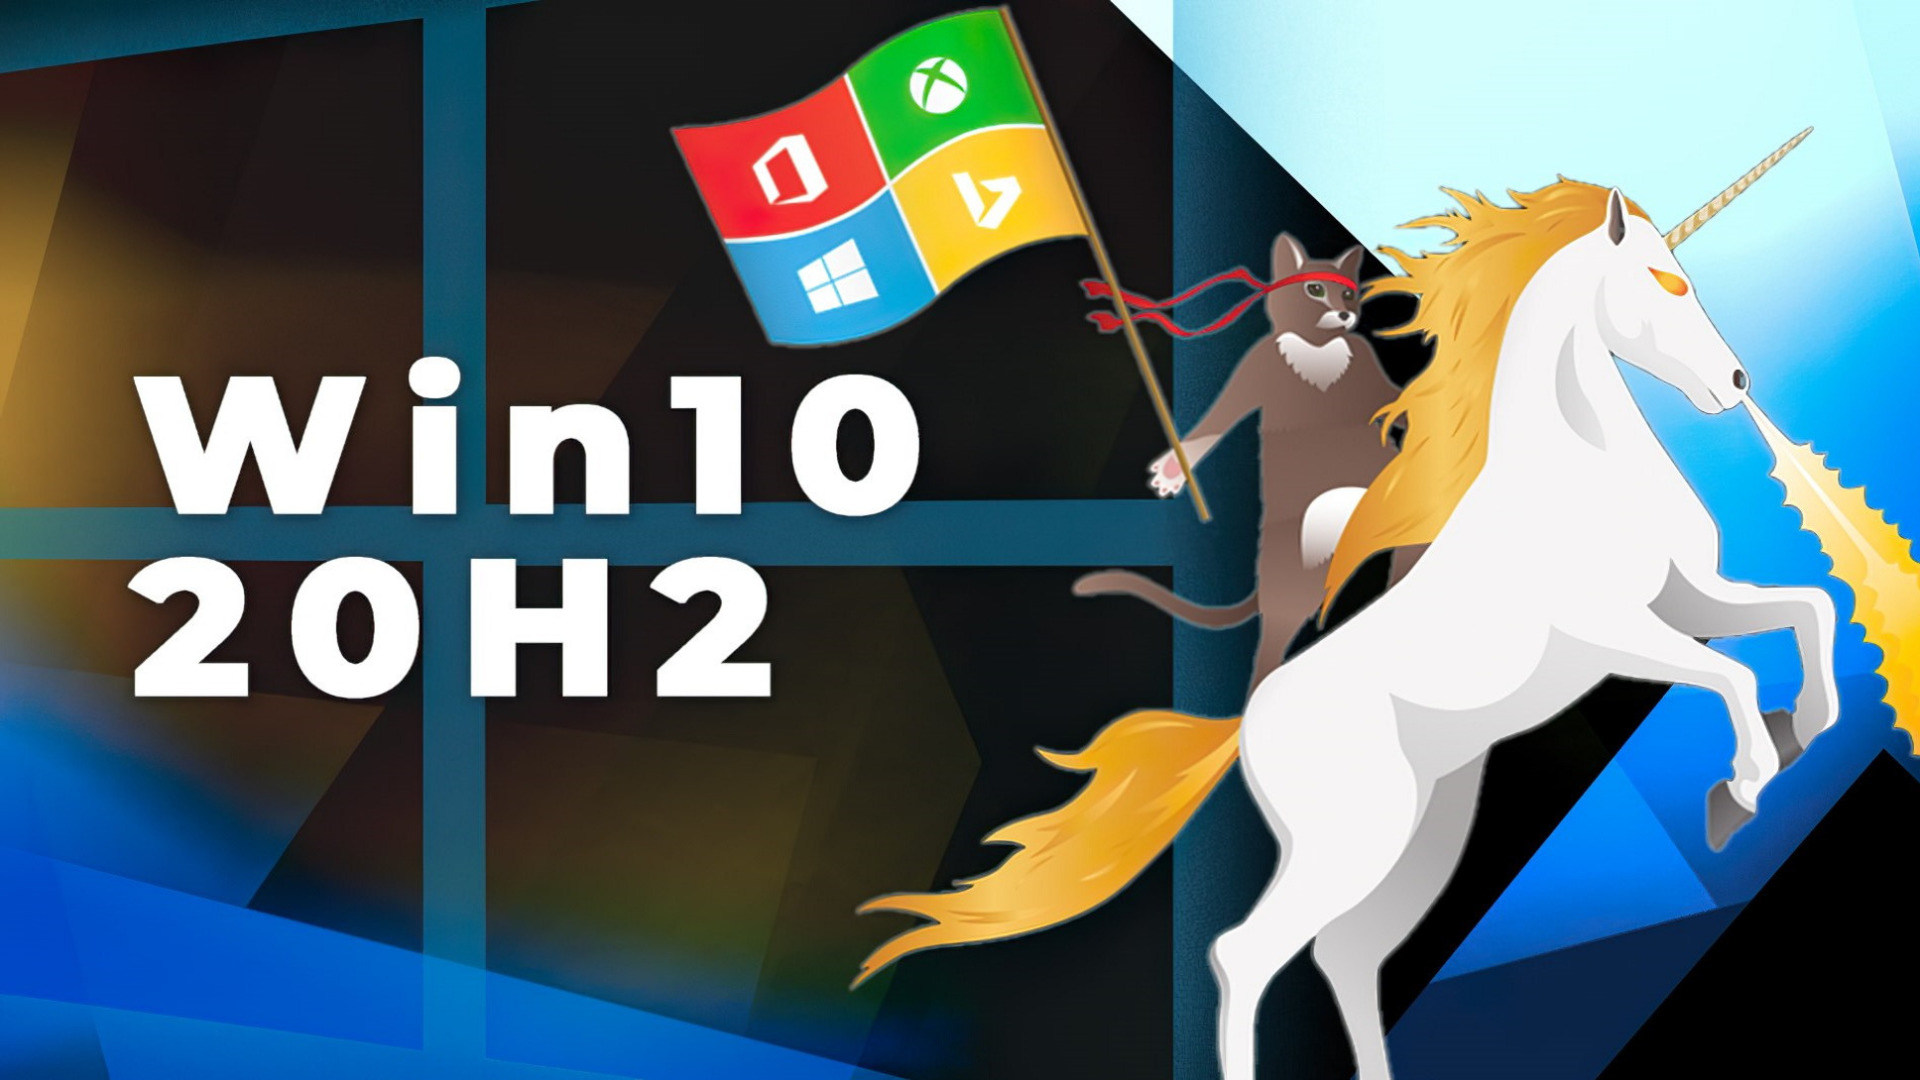 Microsoft, Betriebssystem, Windows 10, Beta, Windows Insider, Insider Preview, Windows 10 Insider Preview, Insider, Windows 10 Preview, Windows Insider Program, Windows Insider Preview, 20h2, Windows 10 Insider, Windows 10 20H2, katze, Windows 10 Beta, Windows Beta, Dinosaurier, Windows 10 Dev, Windows 10 2020, Windows 10 Release, CAT, Windows 10 Cat, Einhorn